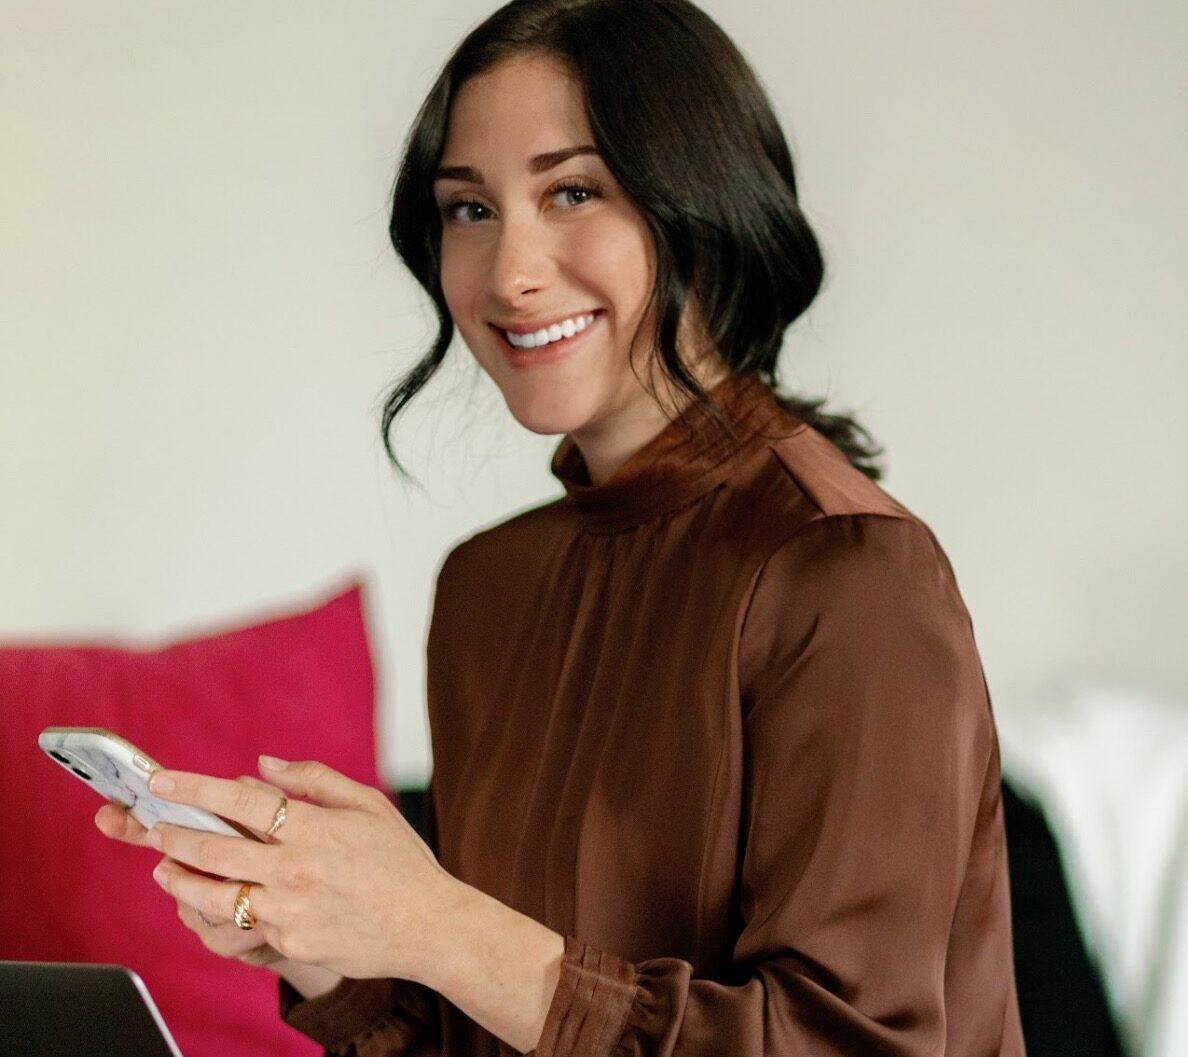 Founder & CEO of a Real Estate Marketing Company - The Social Acre womenontopp.com women on topp